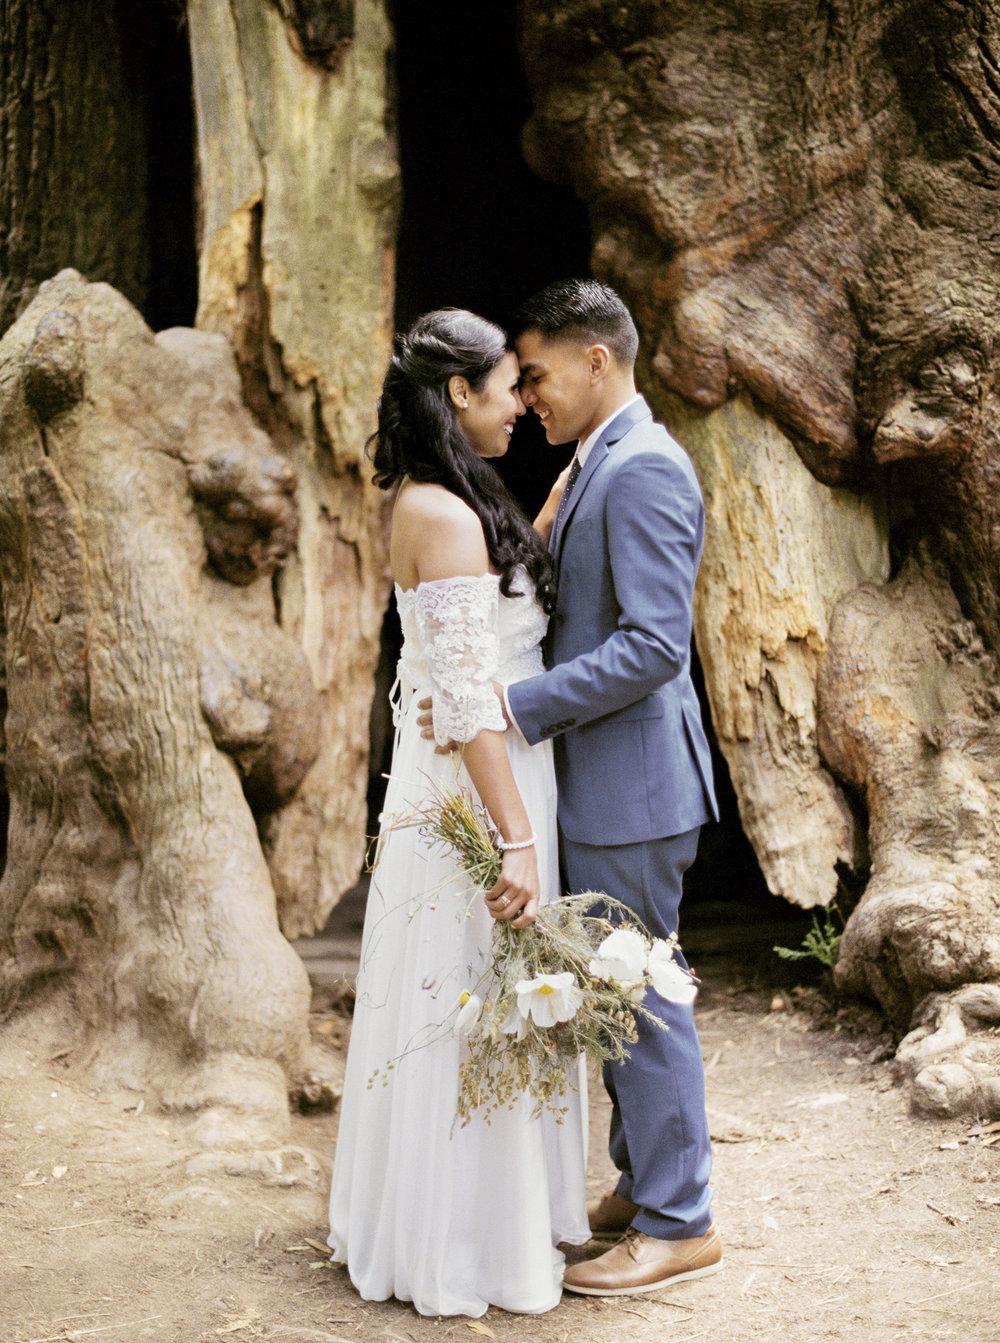 045Wedding+Photo+Video+Company+Luxuary+Weddings+Adventurour+Elopements.jpg